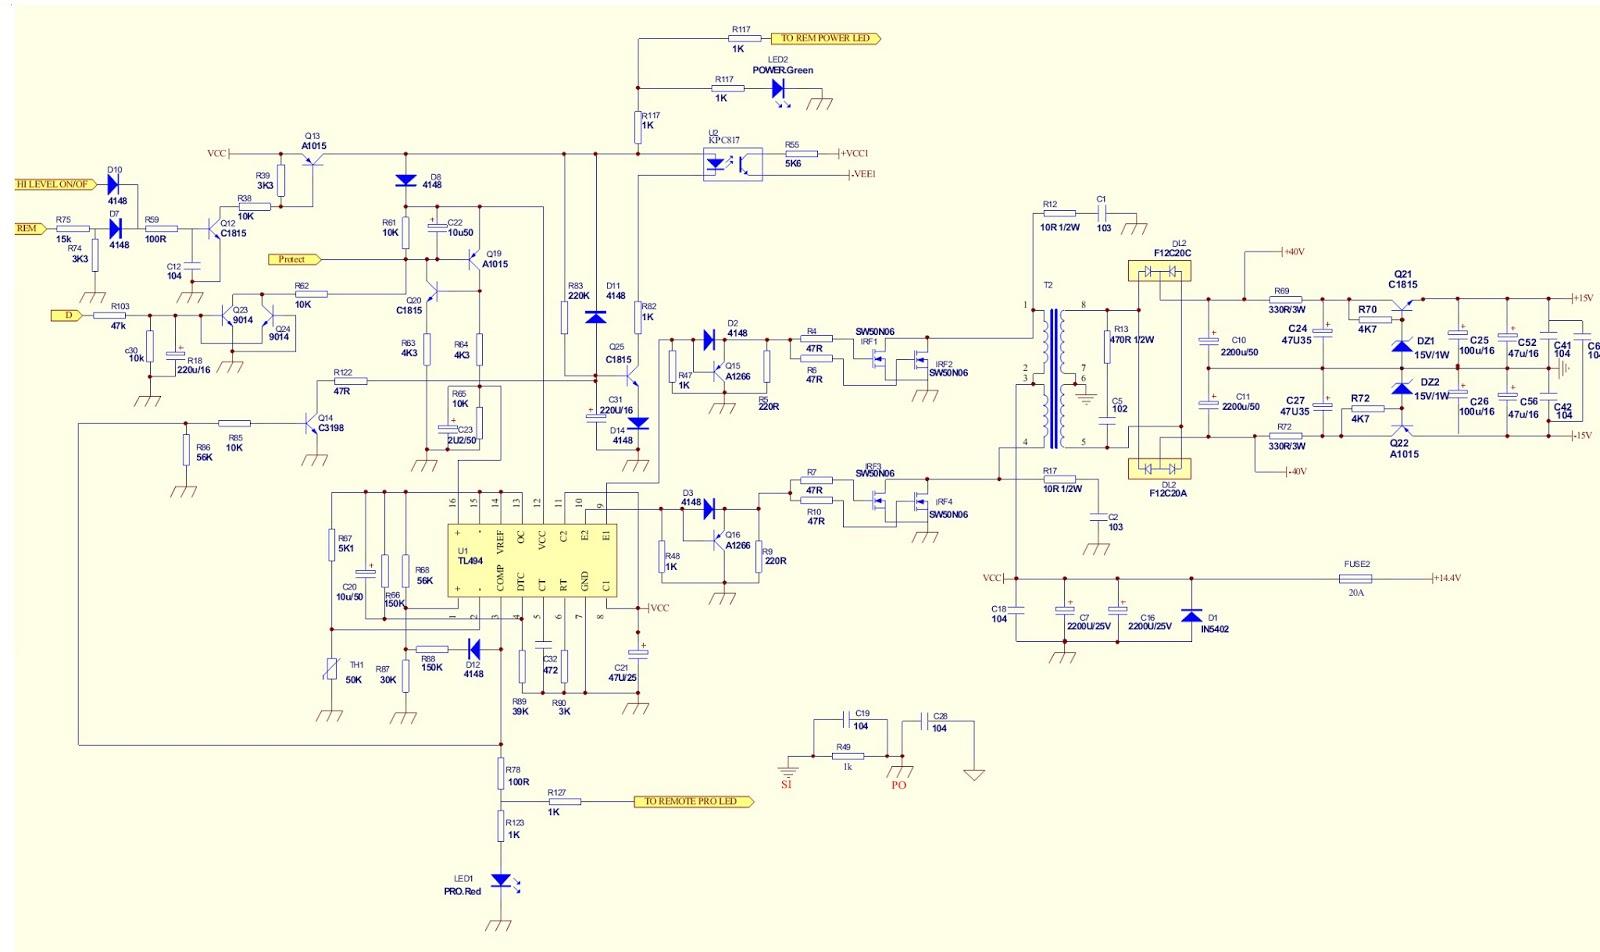 wiring diagram jbl bass pro 12 electro help: jbl gt basspro 12 - setting controls ...